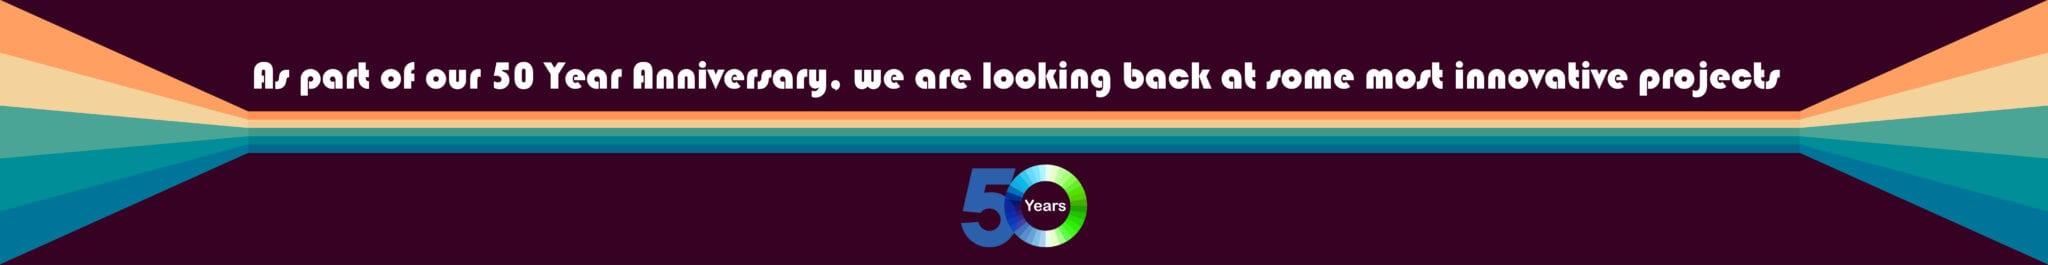 Case Study - 50 Years